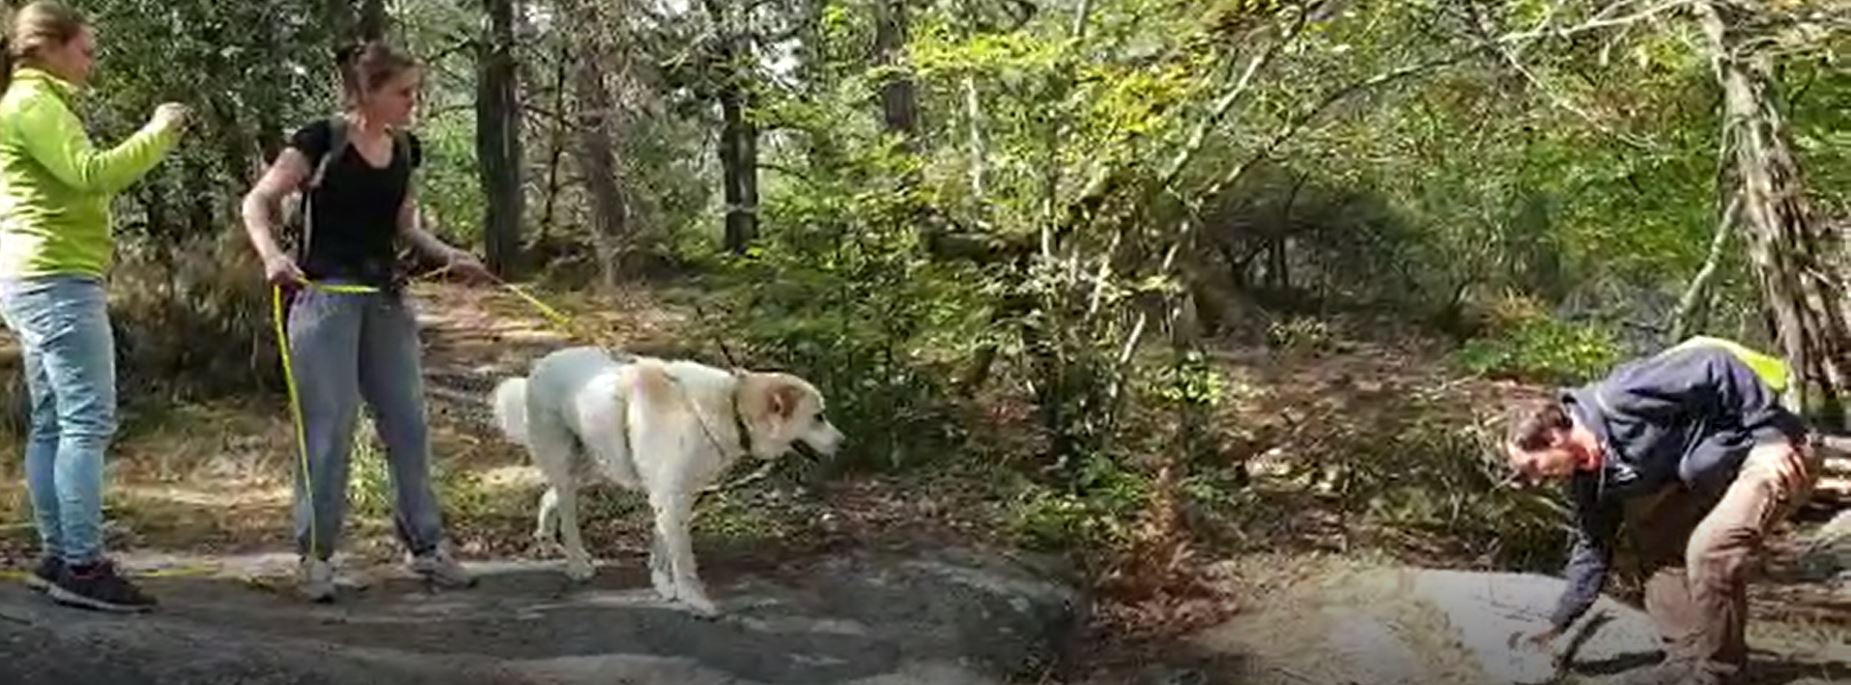 Mantrailing_Simplicite Canine.JPG